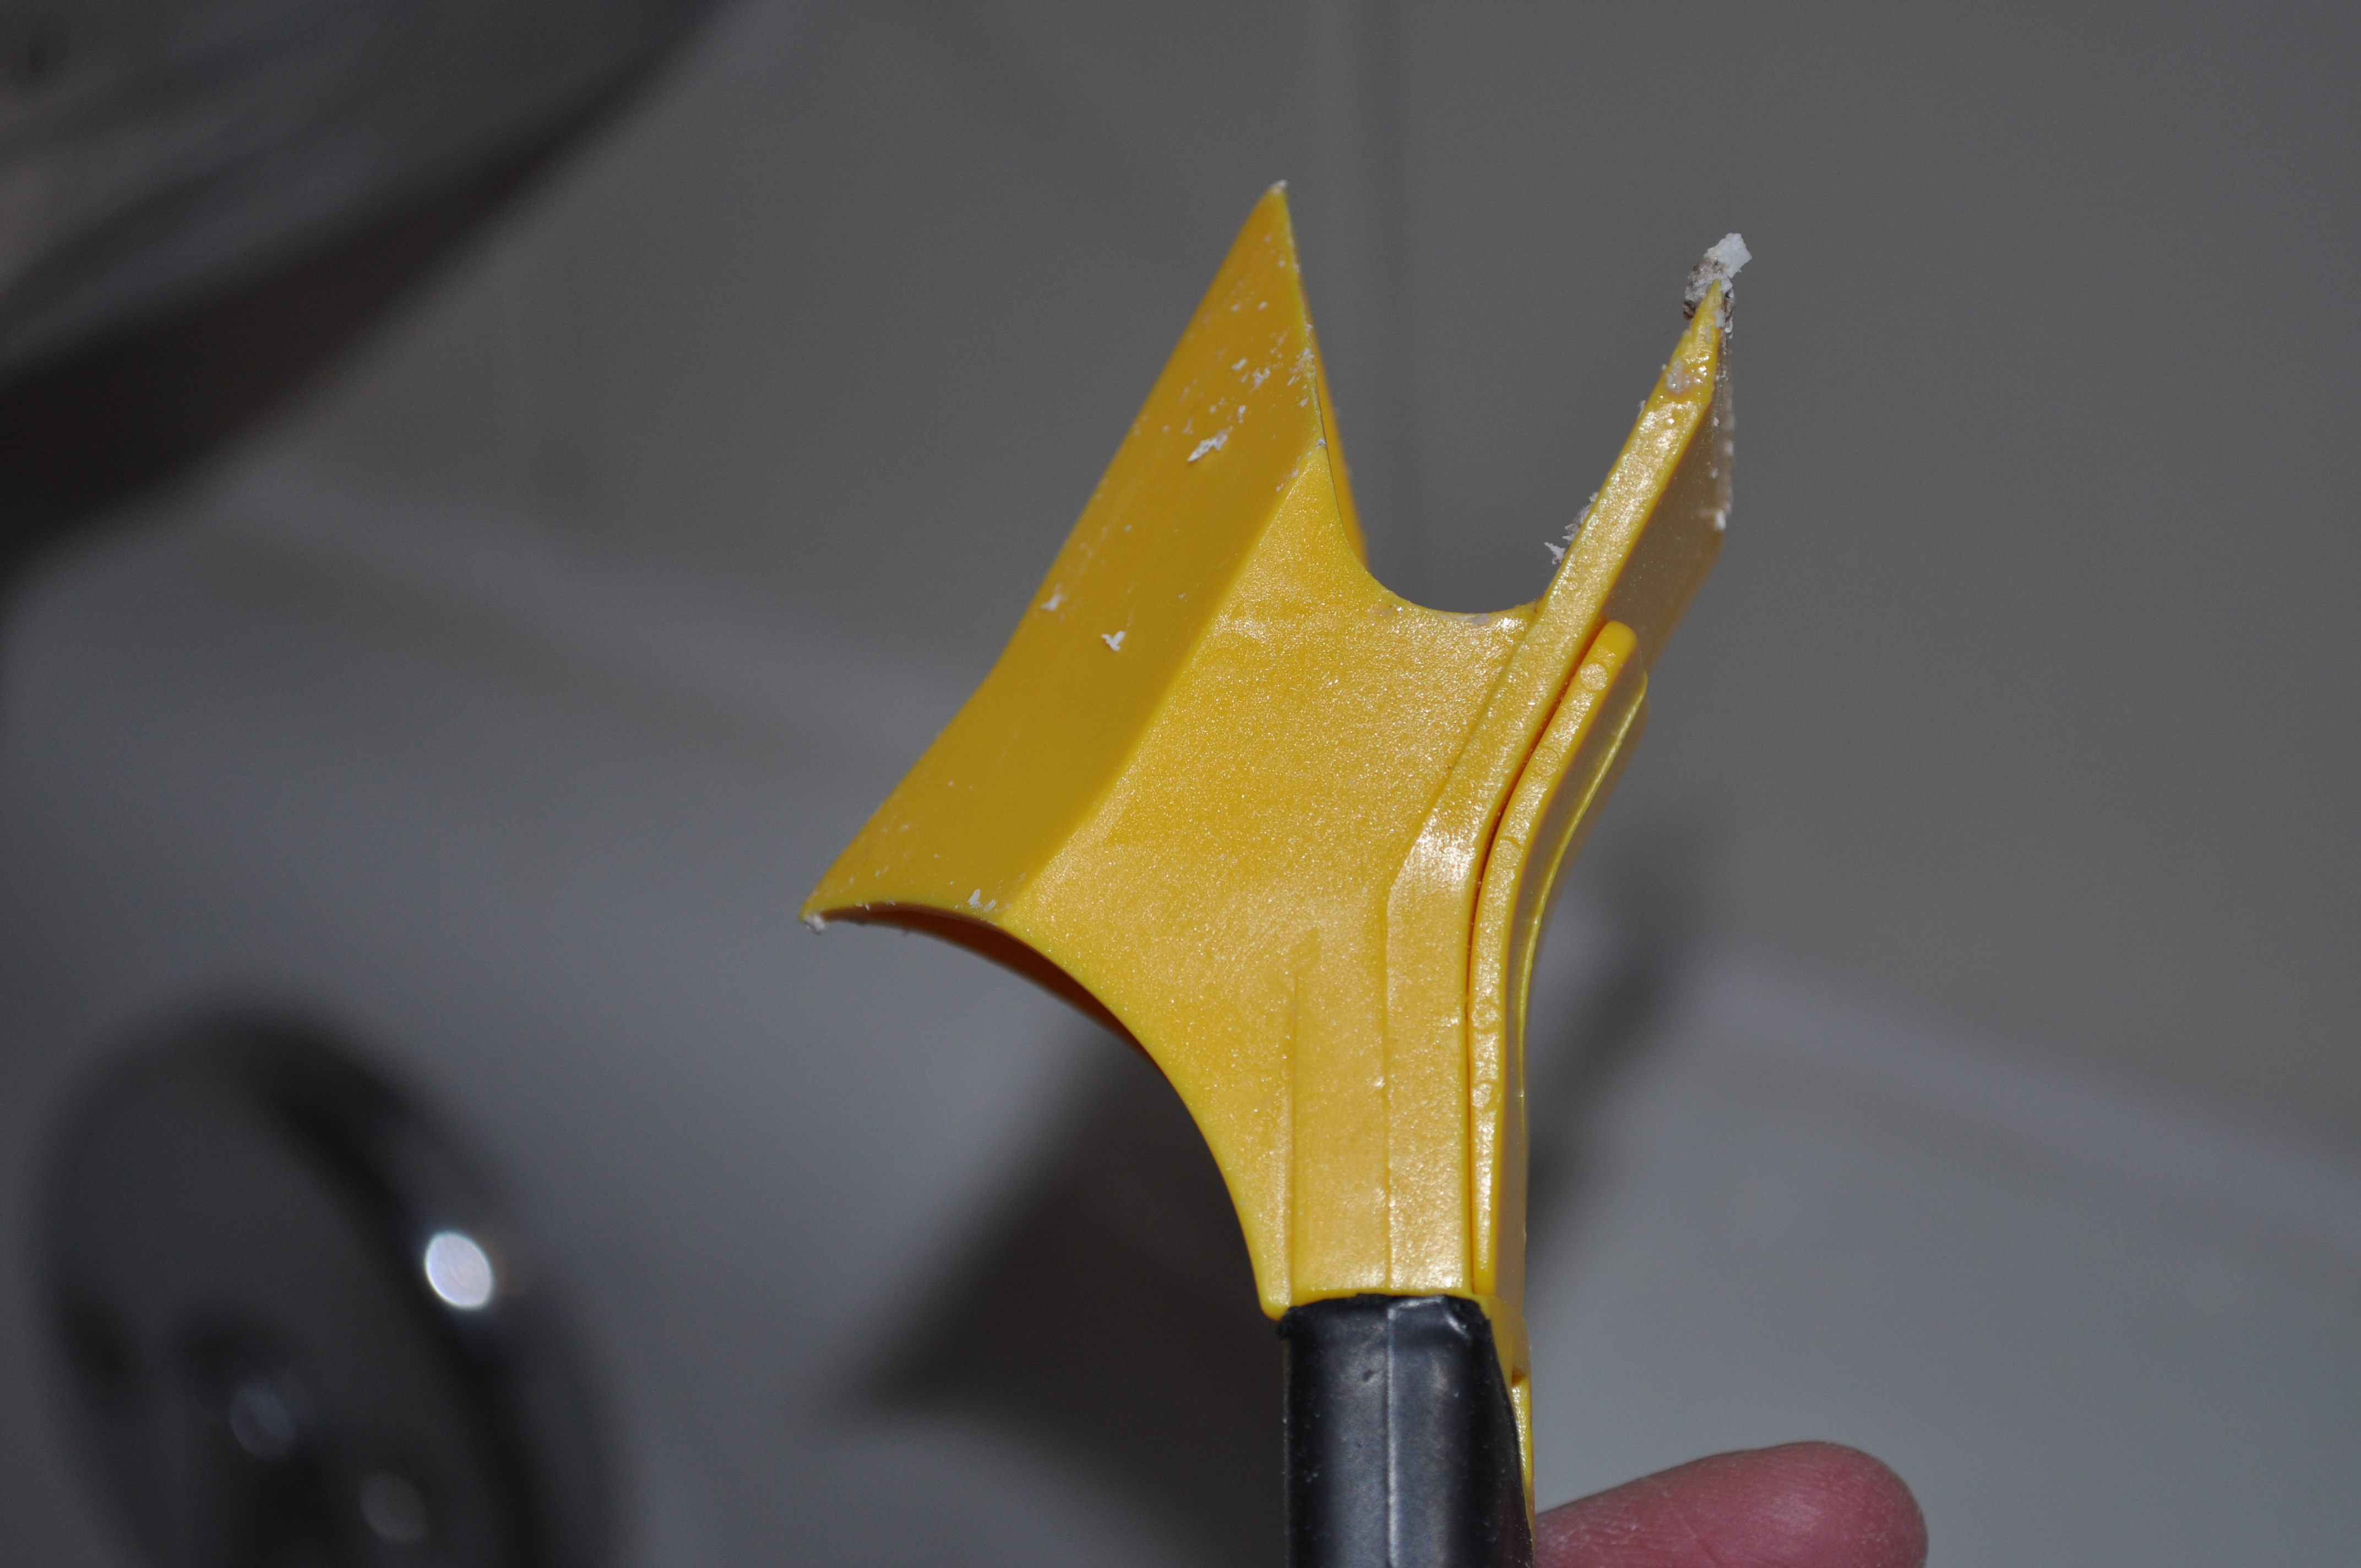 Bathroom caulk remover - Handy Little Caulk Remover Tool Careful It S Sharp